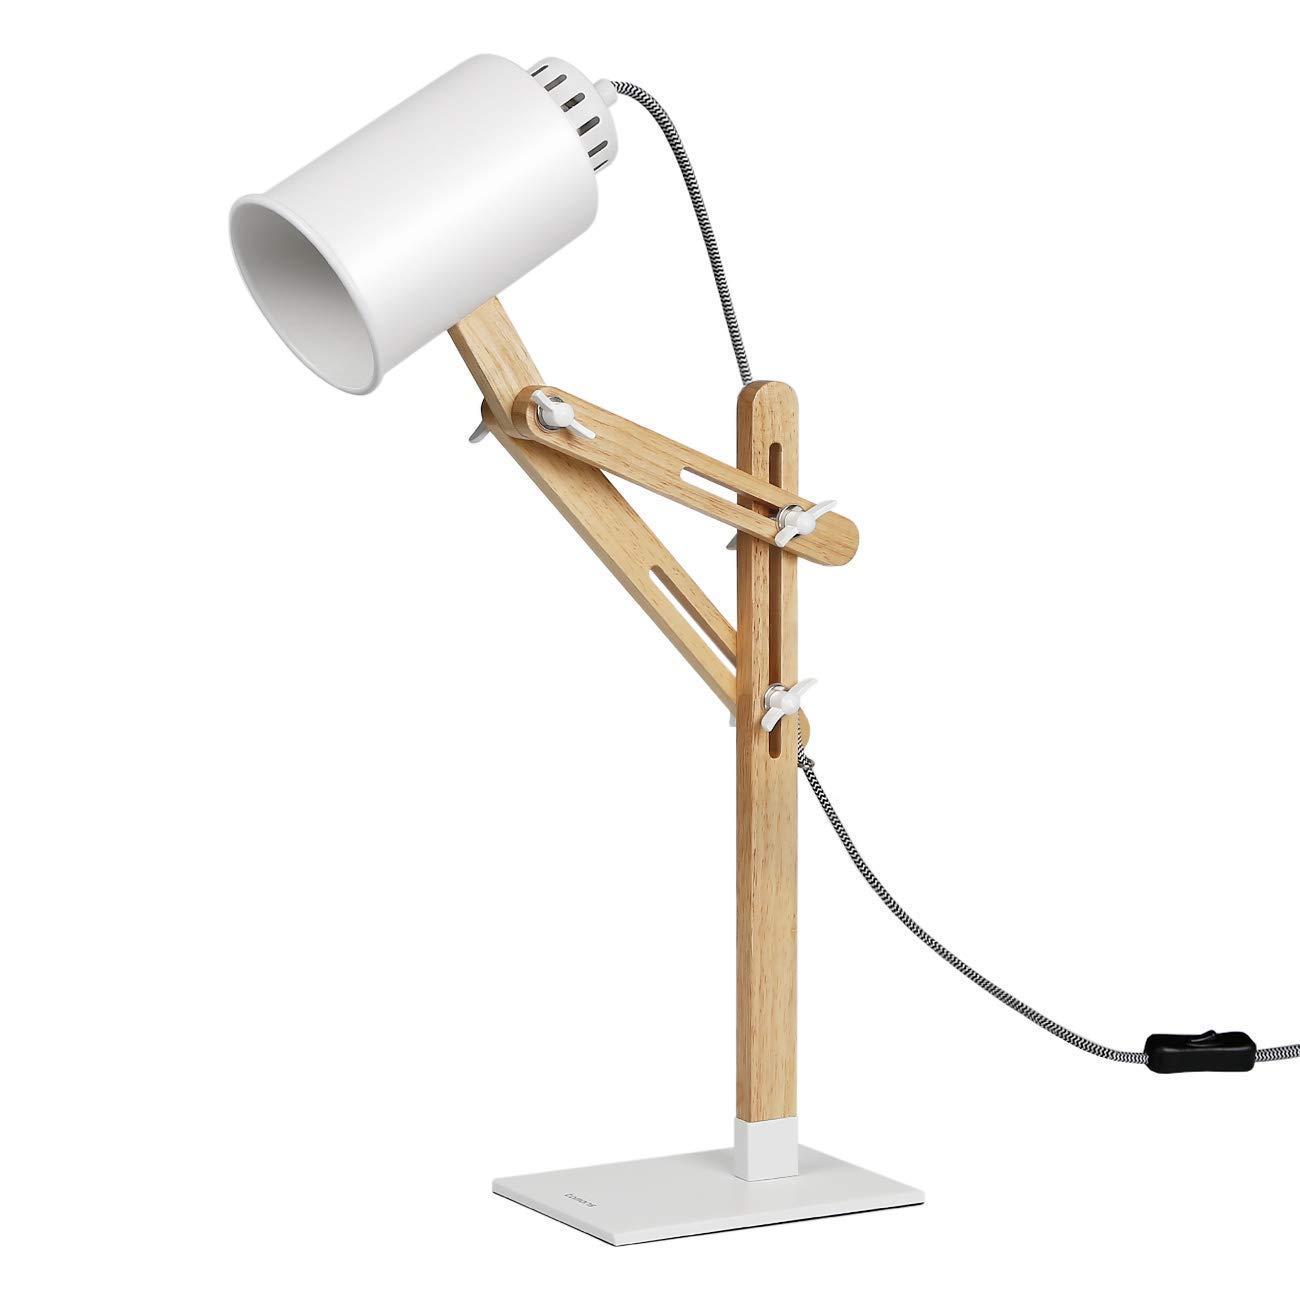 Tomons Dl1005us W Led Desk Lamp Wooden Multi Angle Swing